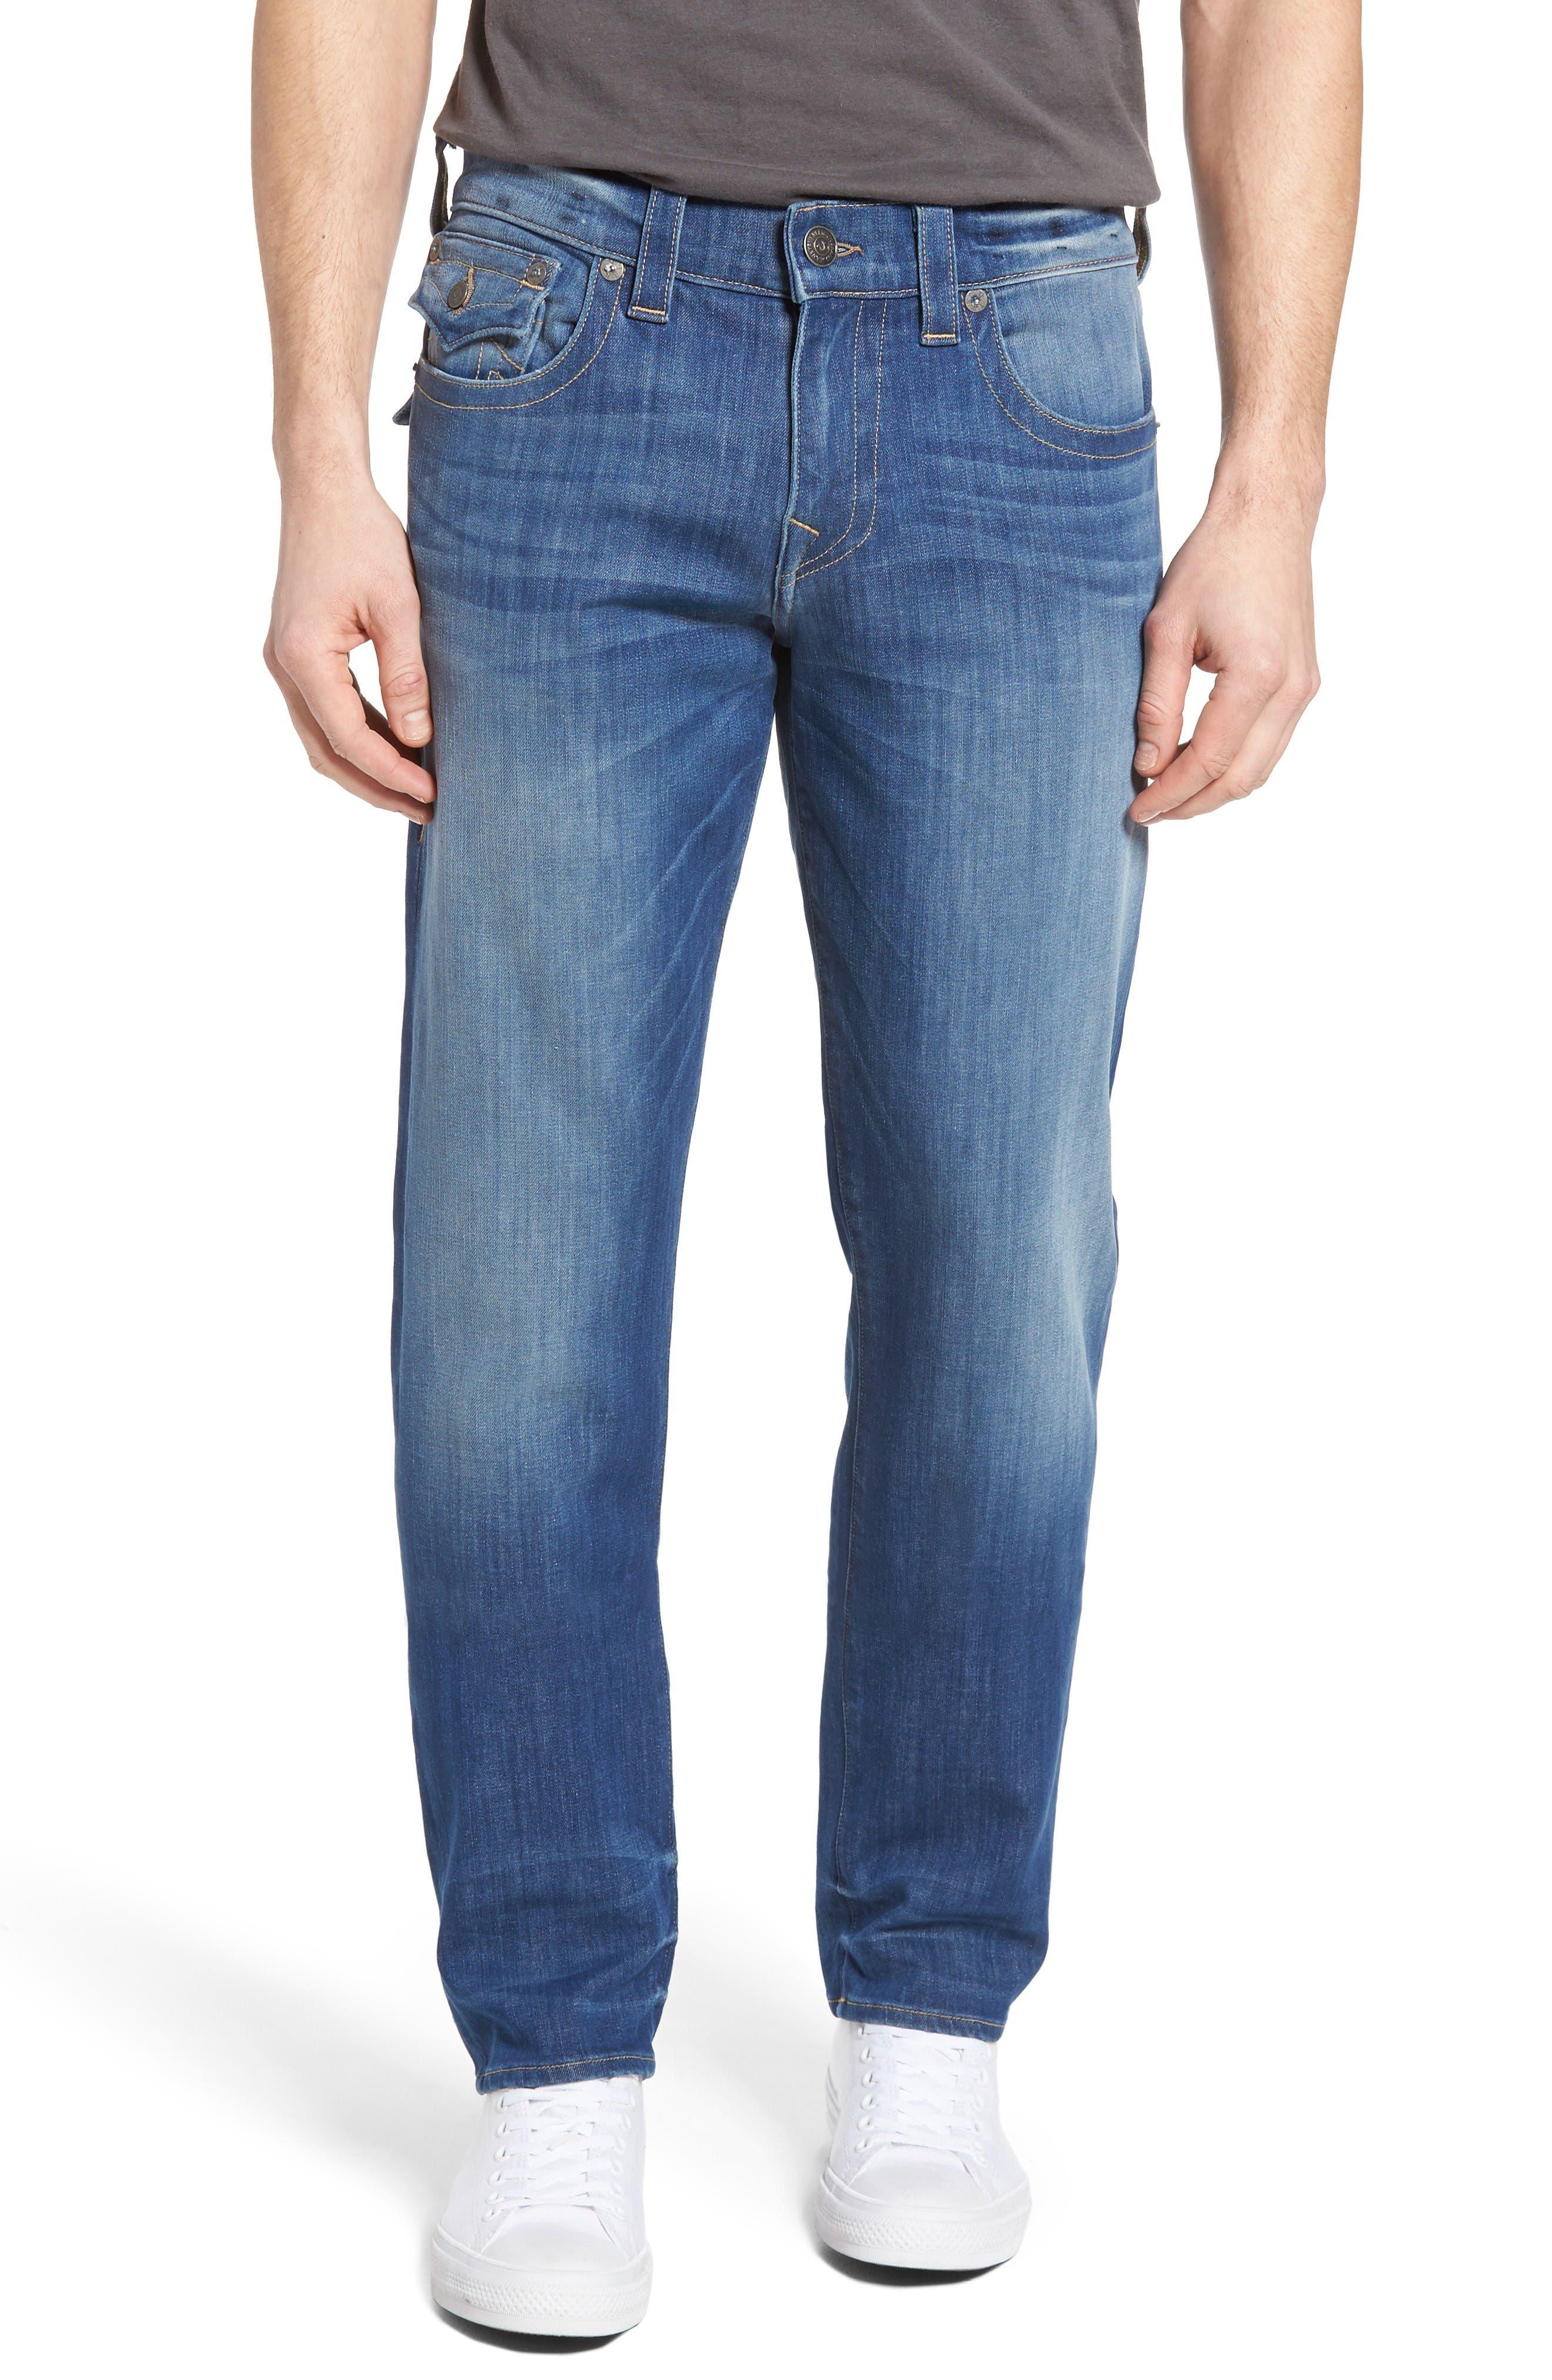 True Religion Brand Jeans Geno Straight Leg Jeans (Sun Faded)